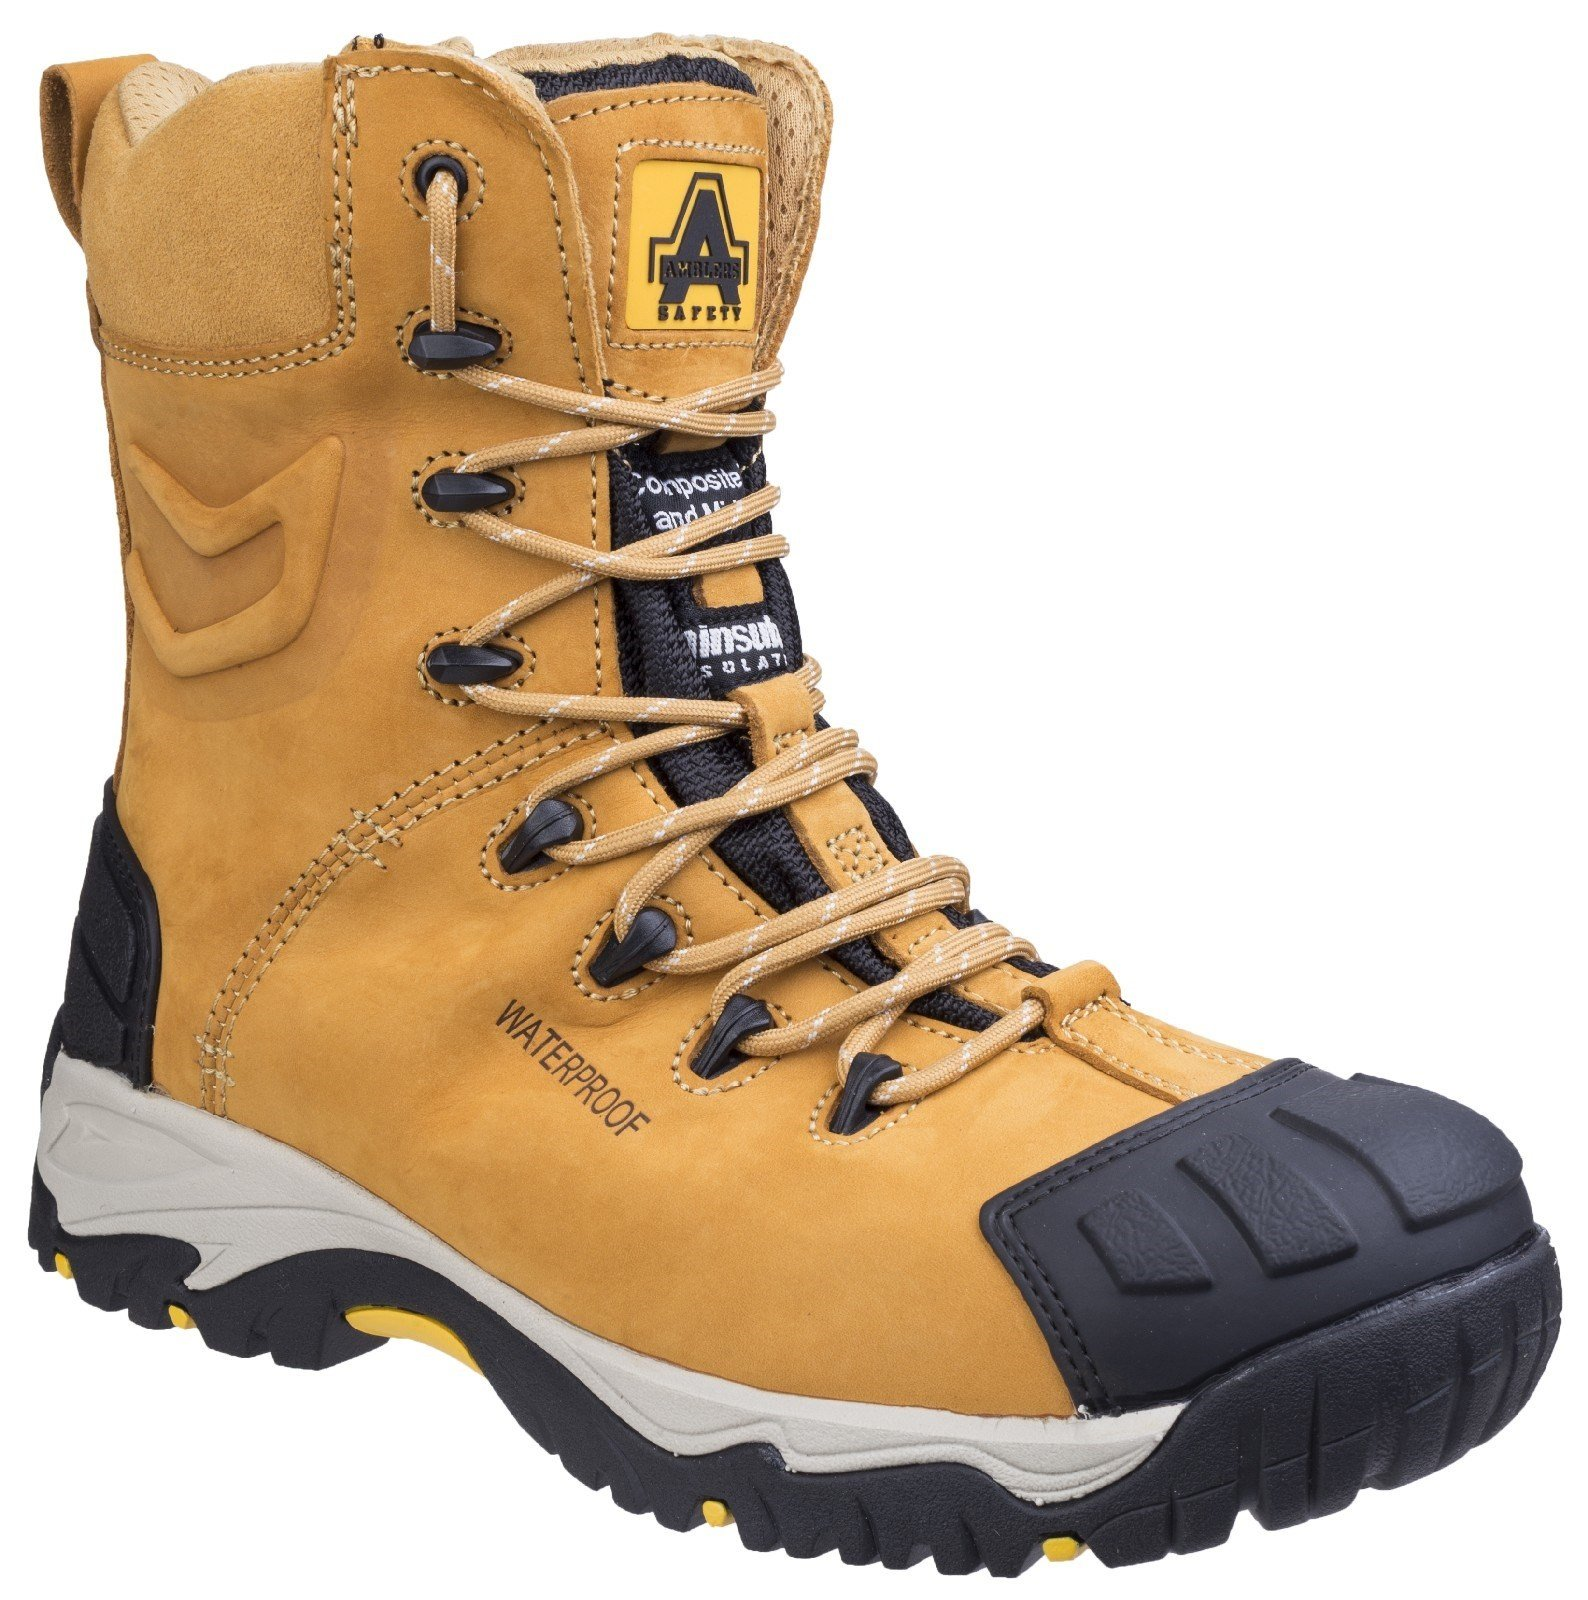 Amblers Unisex Safety Waterproof Lace up Boot Honey 21517 - Honey 12